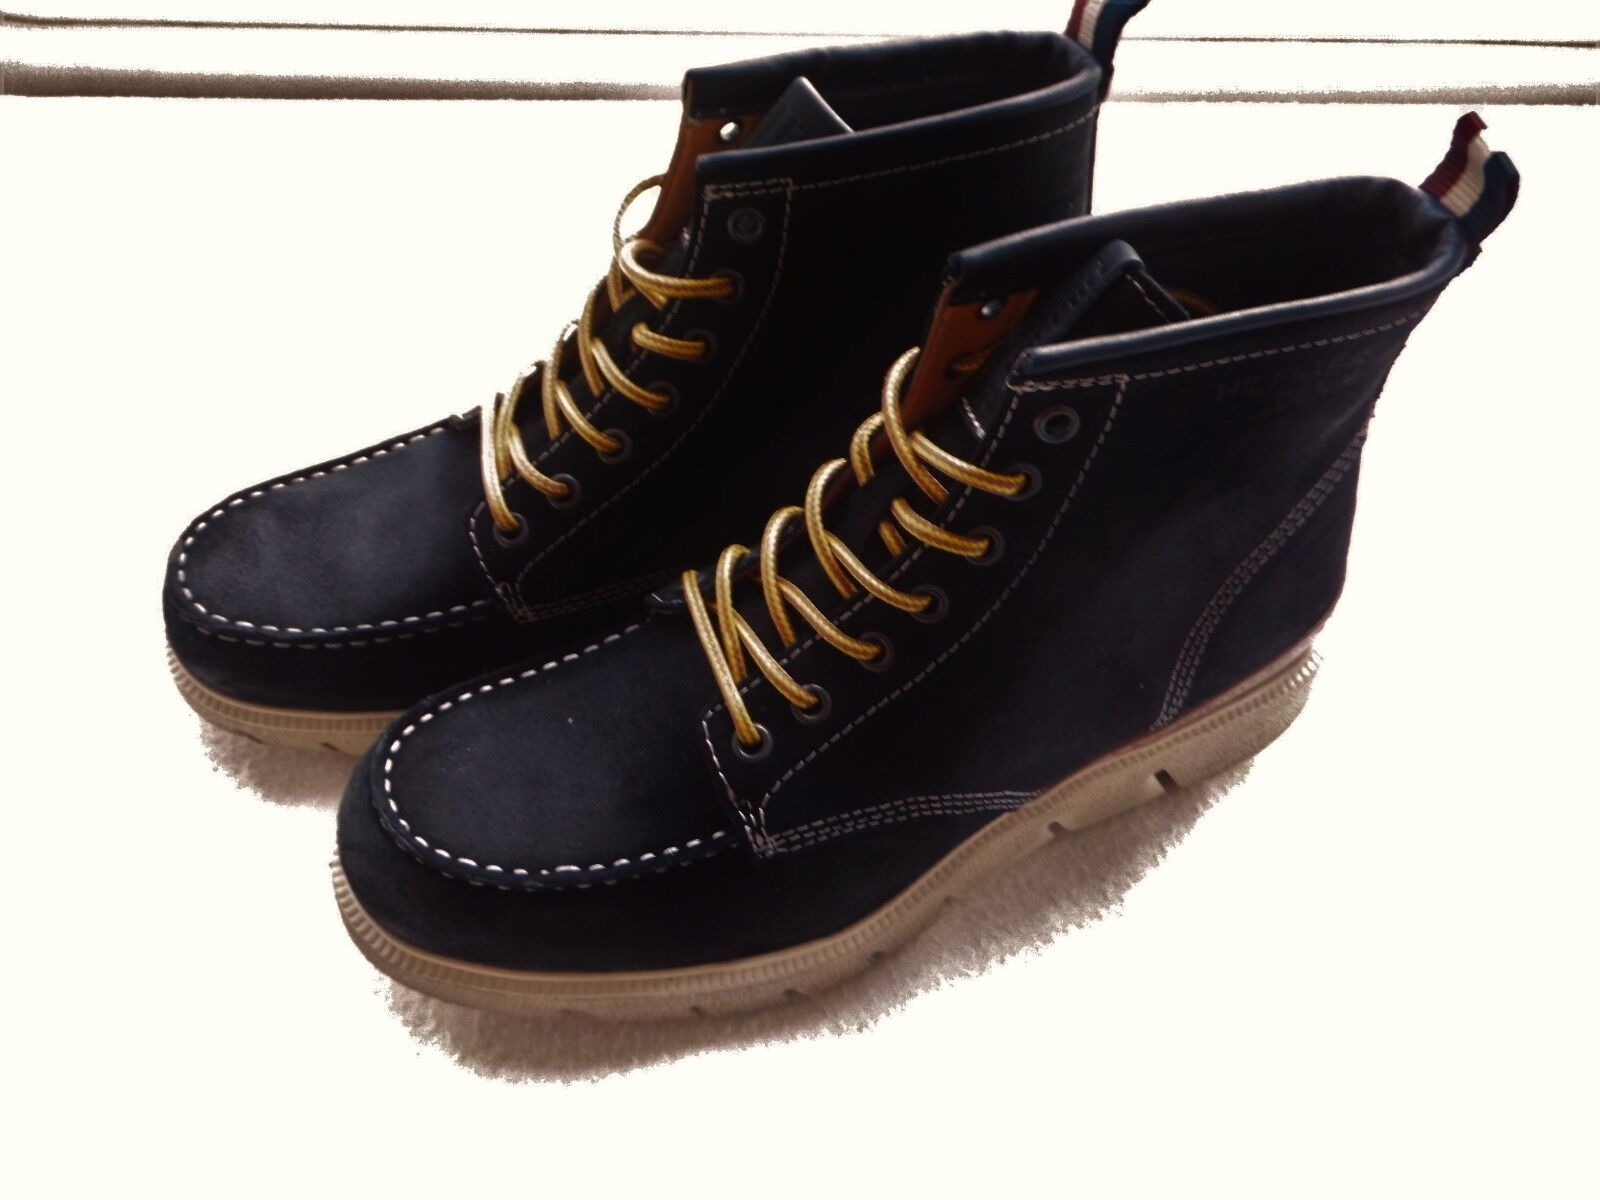 Tommy Hilfiger Business-Schuhe Wildleder Business-Schuhe Hilfiger Stiefel Gr.44 NEU! 0a46bf